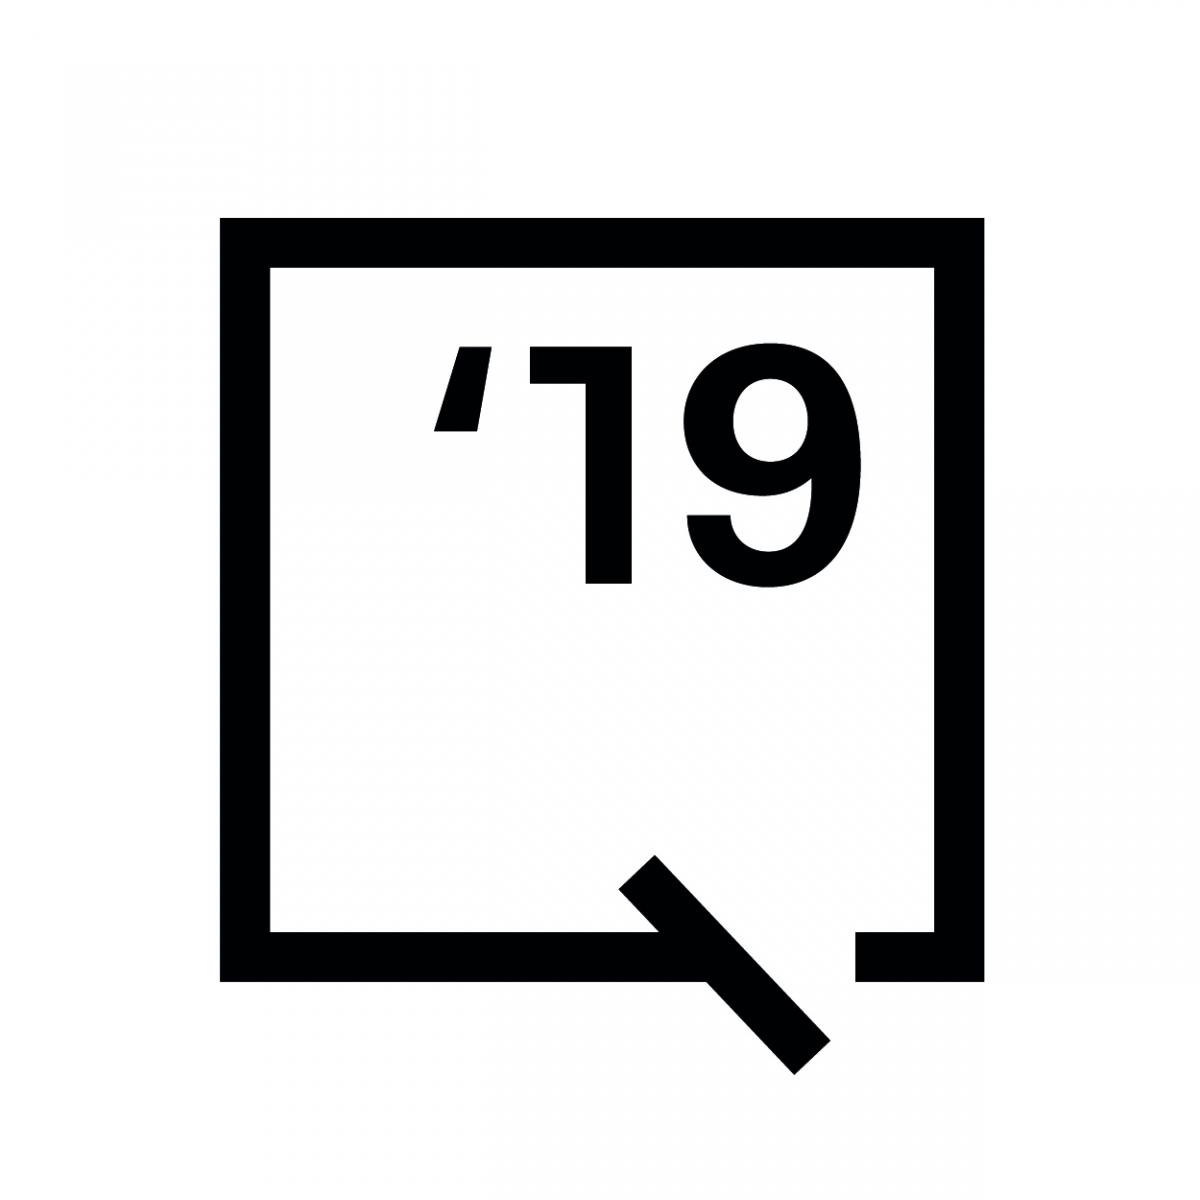 kvadrienale_19_01